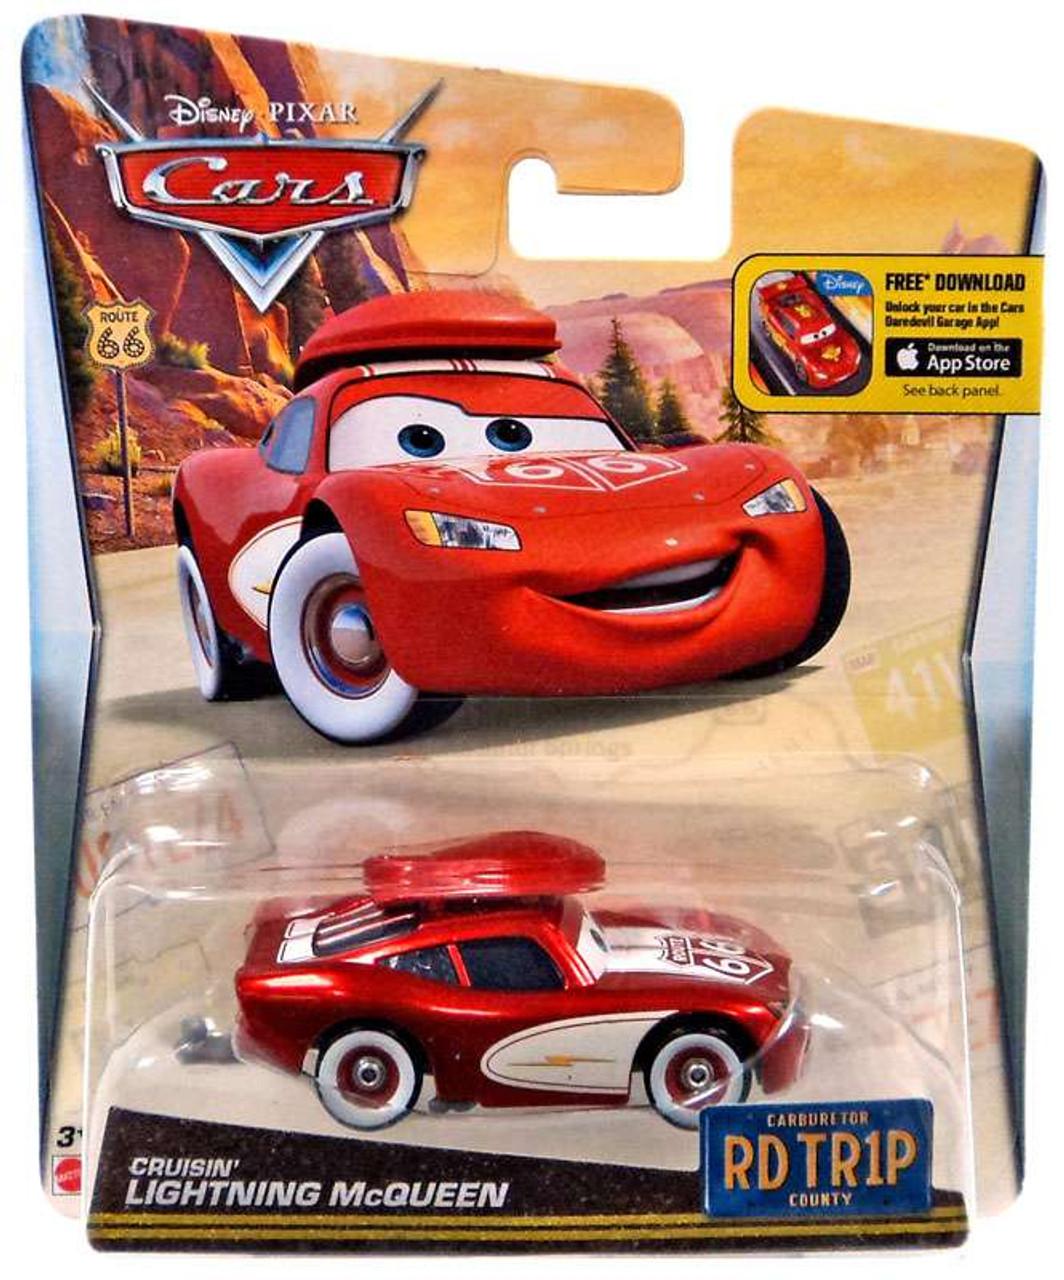 Disney Pixar Cars RD TR1P Cruisin Lightning McQueen 155 Diecast Car ...